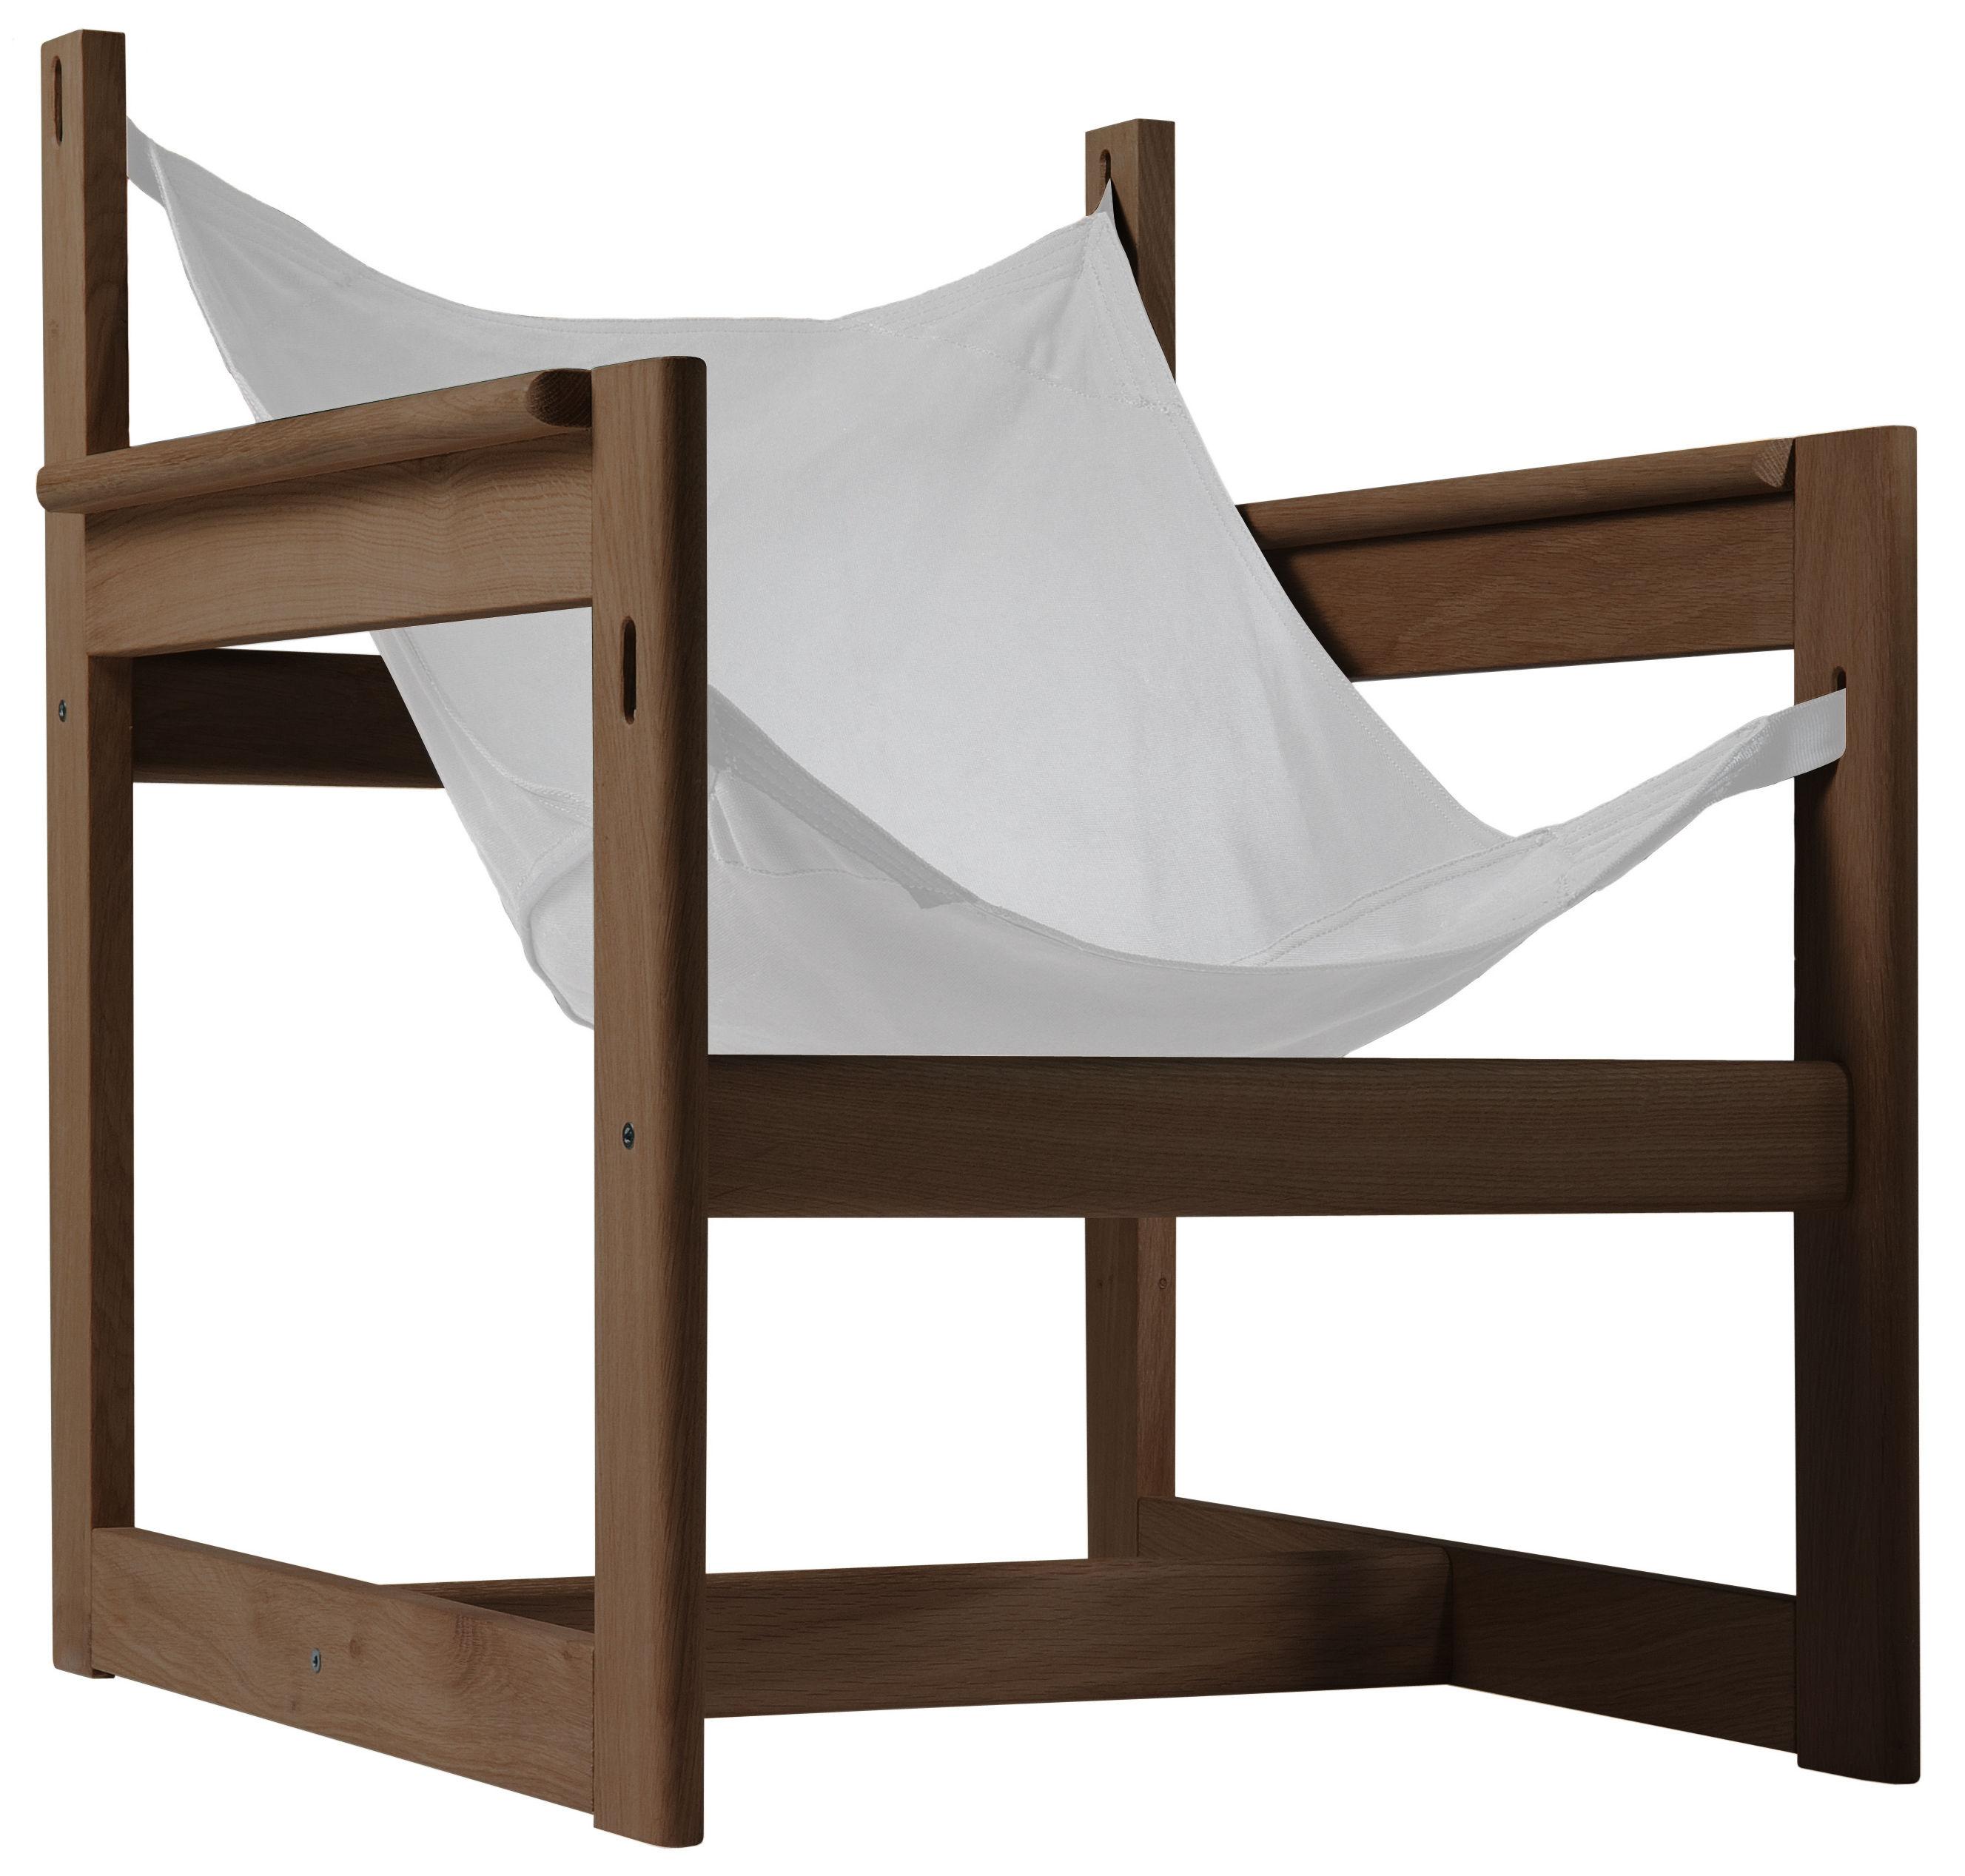 Möbel - Lounge Sessel - Pelicano Sessel - Objekto - Korpus Nussbaum / Baumwollbezug natur - Baumwolle, Nussbaum